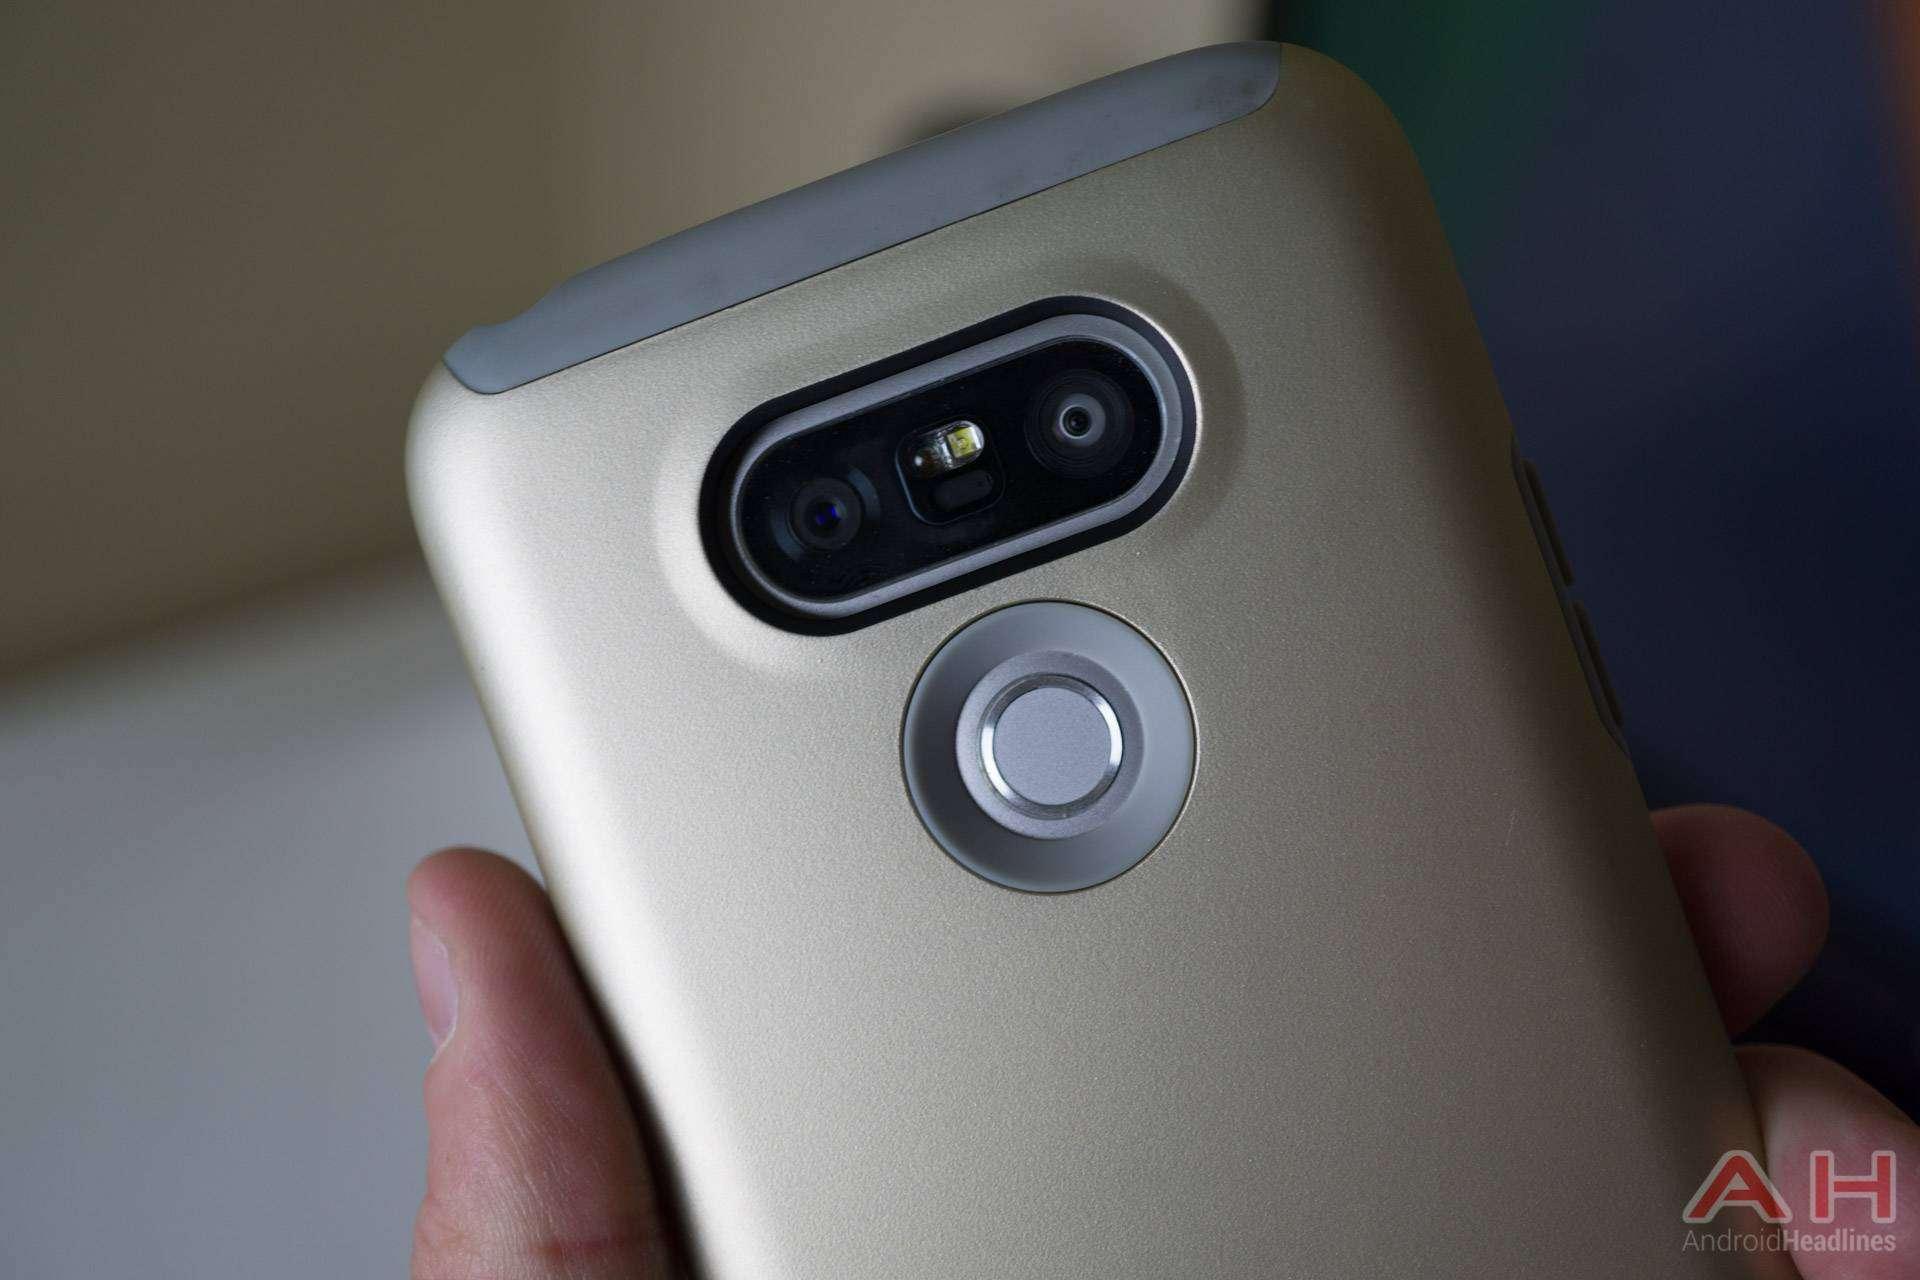 Incipio-DualPro-LG_G5 (6 of 9)